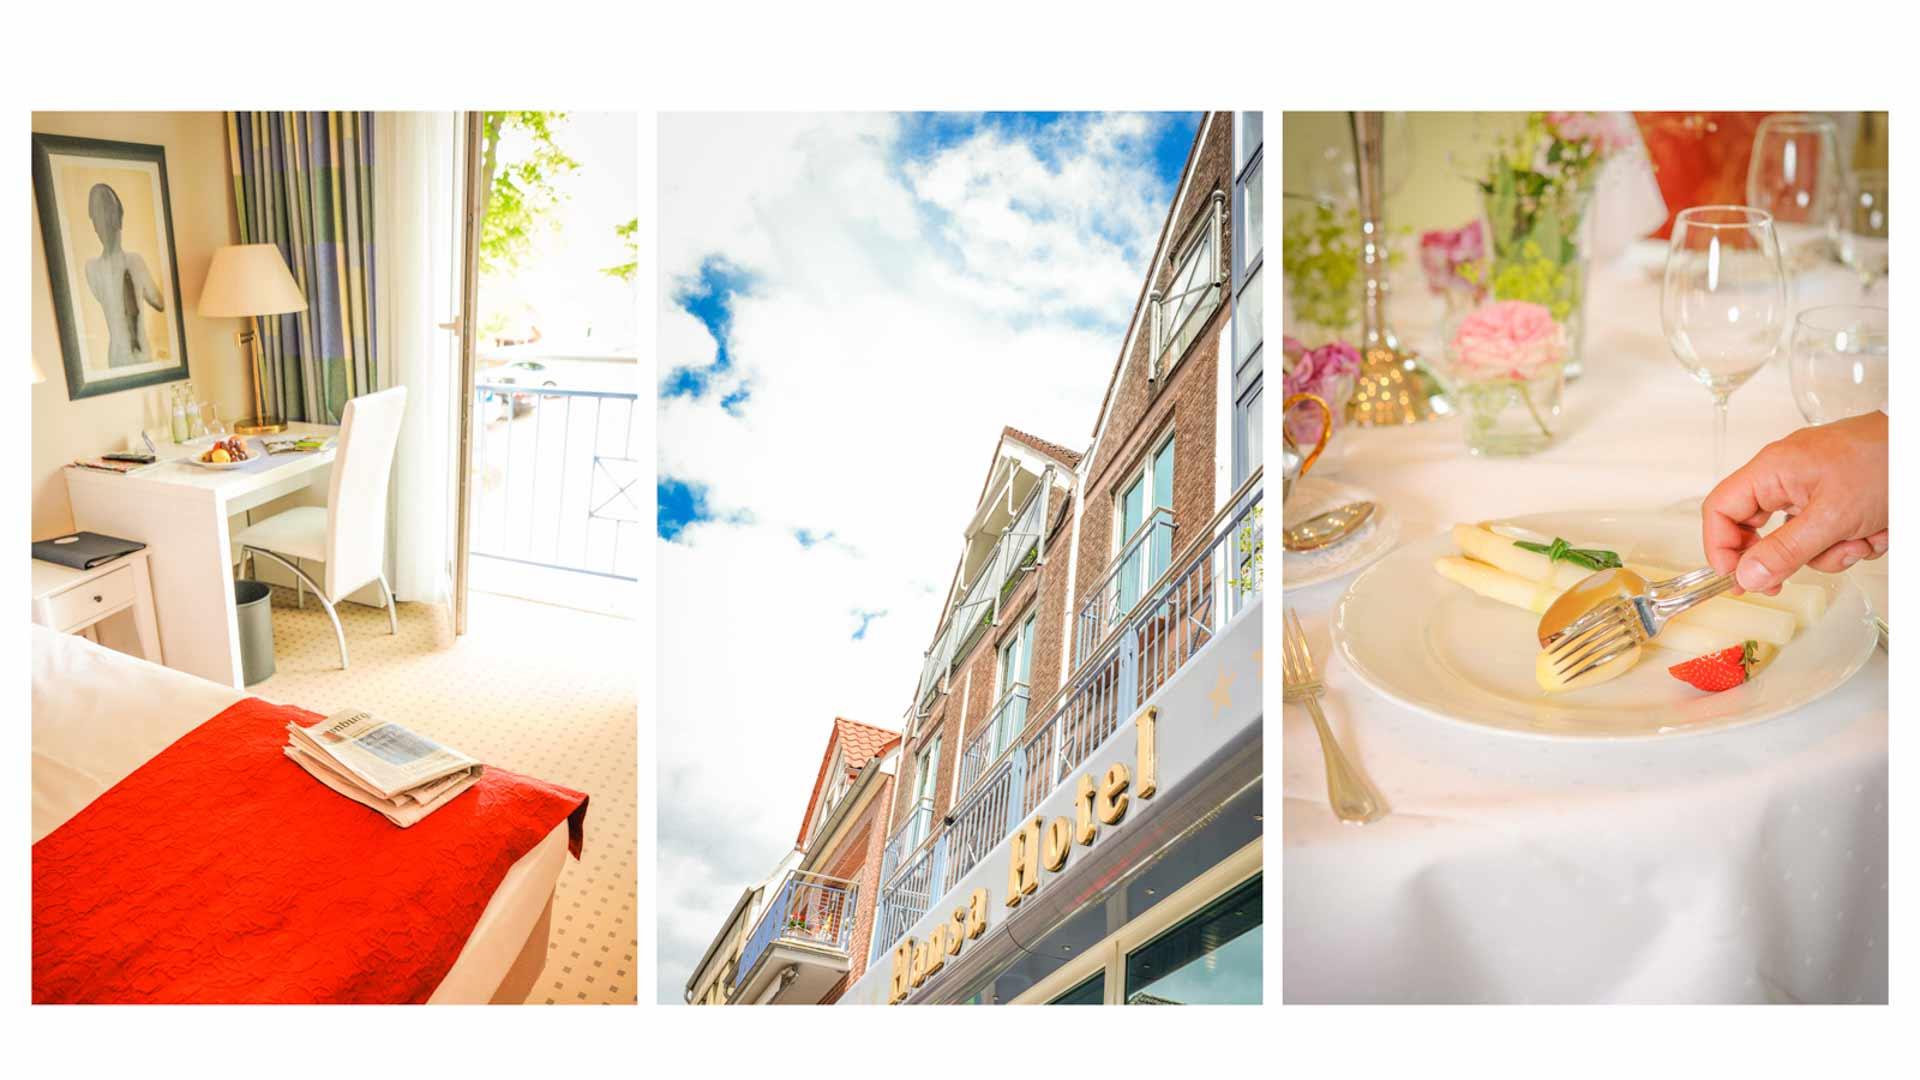 Fotografie Nicole Franke - Commercial Hotel